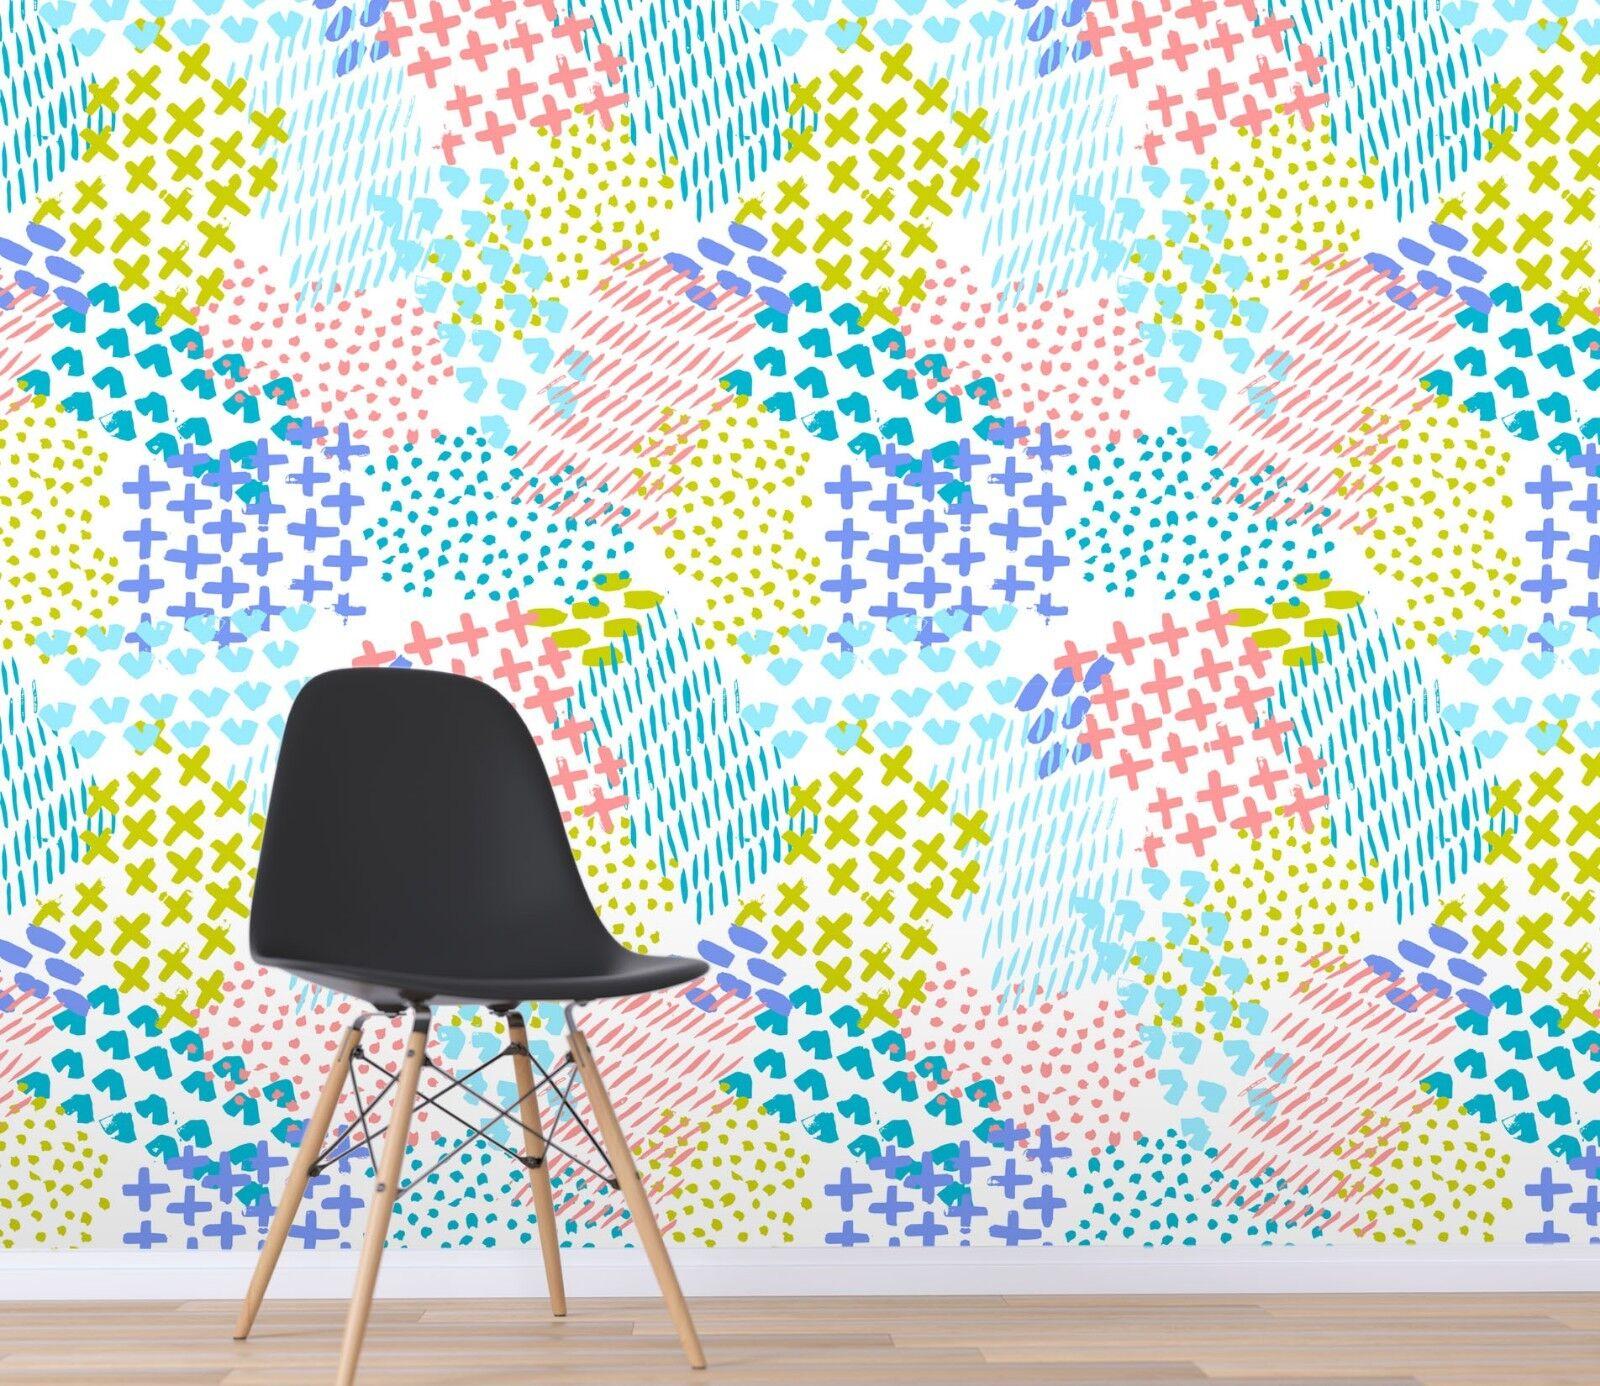 3D Farbe Graffiti 3 Wallpaper Mural Print Wall Indoor Wallpaper Murals UK Summer